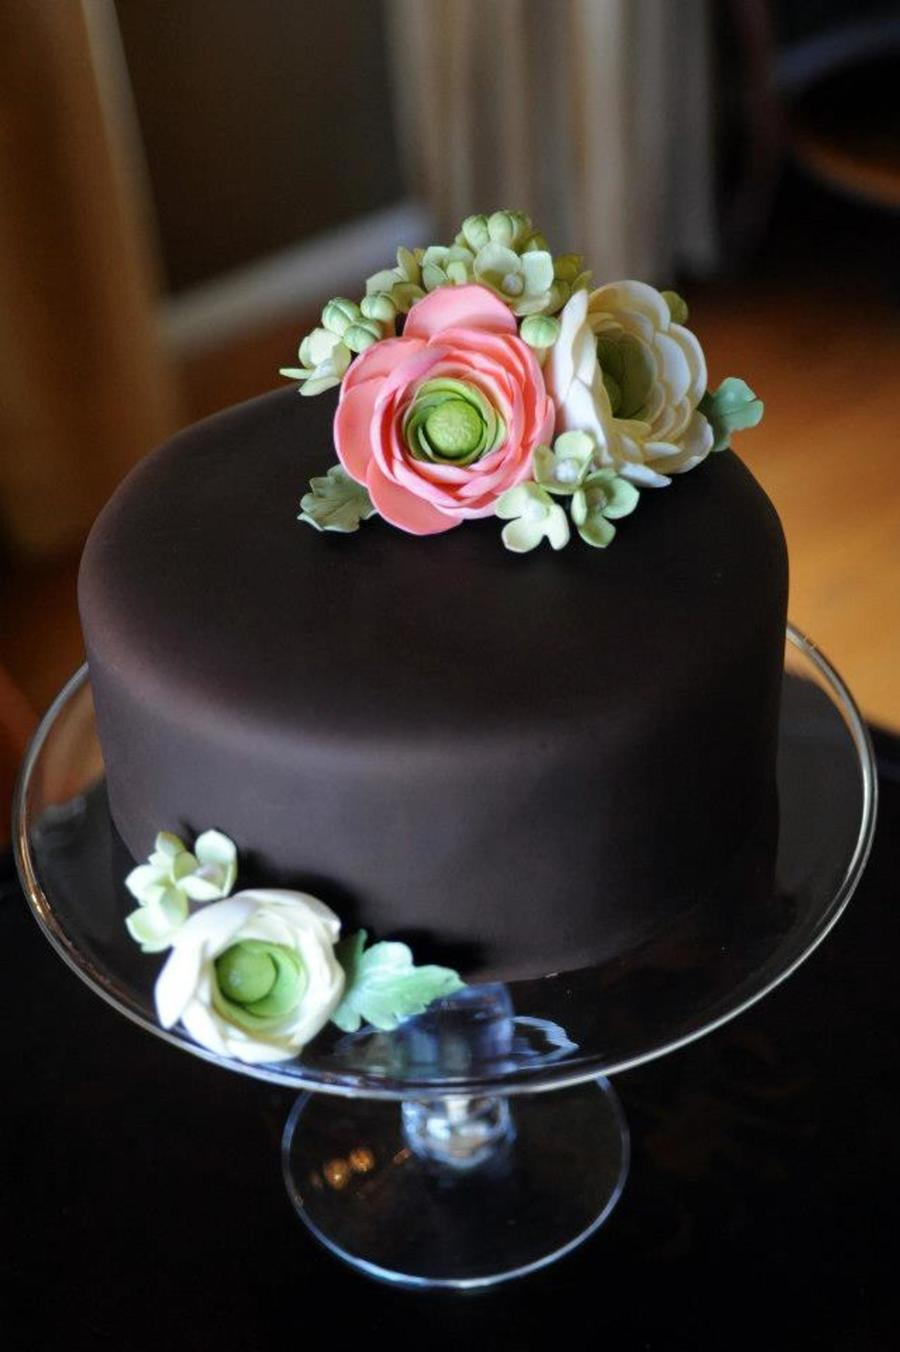 Gumpaste Flowers On Chocolate Fondant Cake - CakeCentral.com